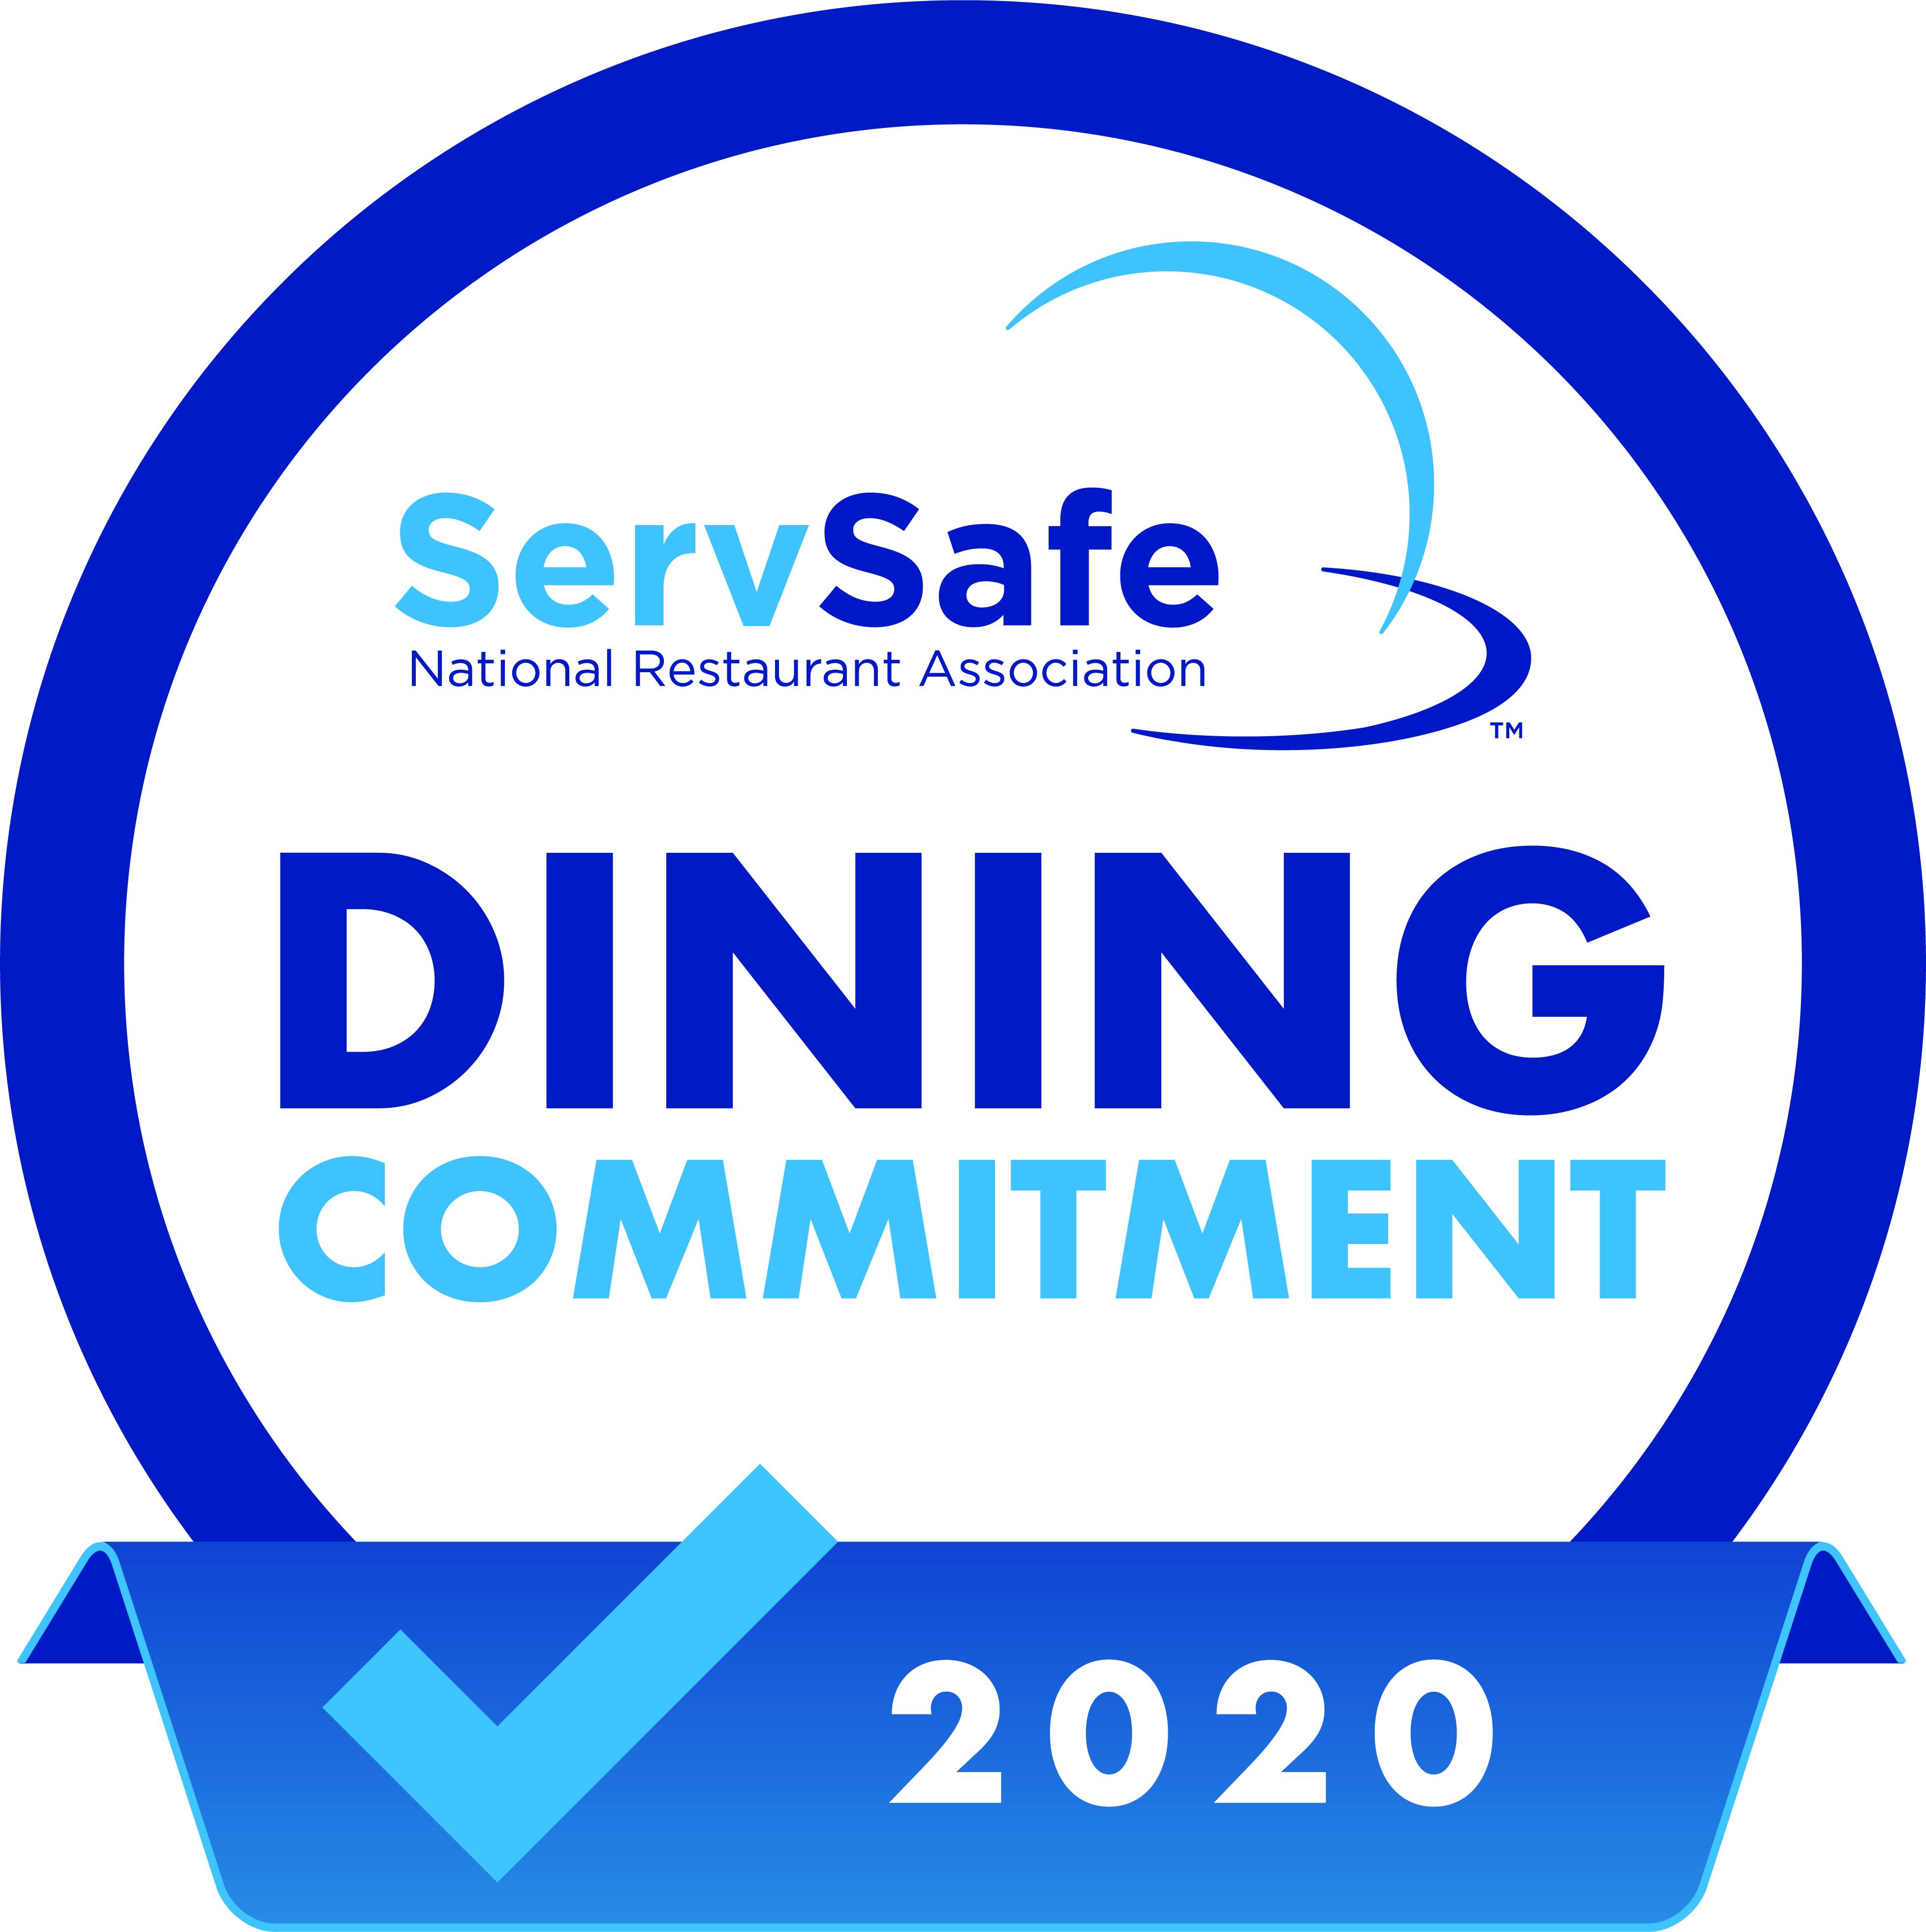 servsafe-diningcommitment-4c.jpg